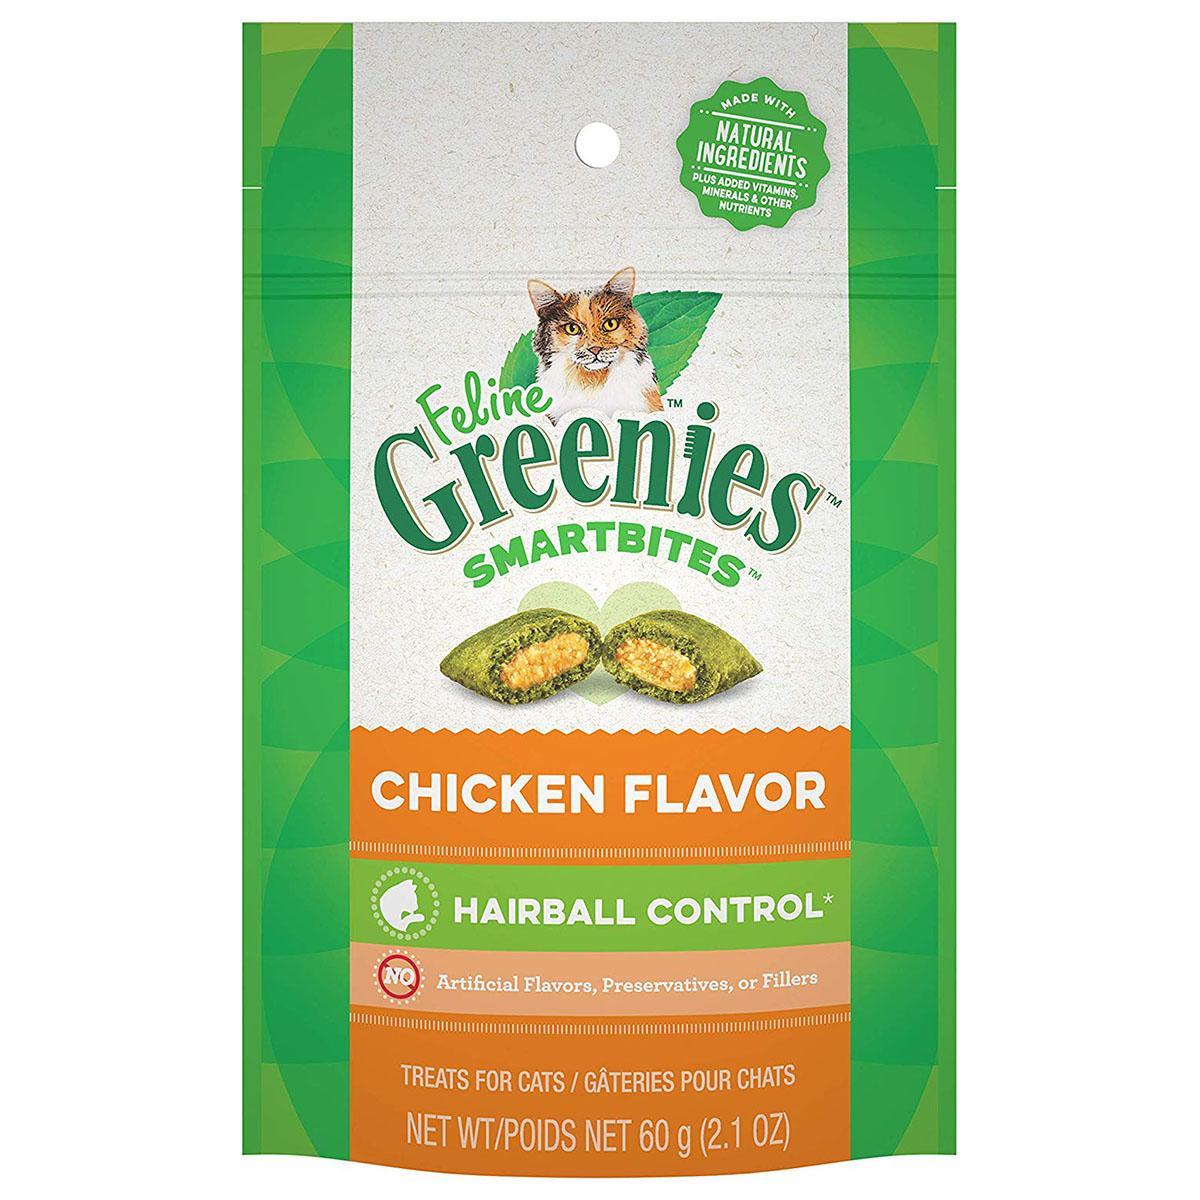 Greenies Smartbites Hairball Control Cat Treats - Chicken